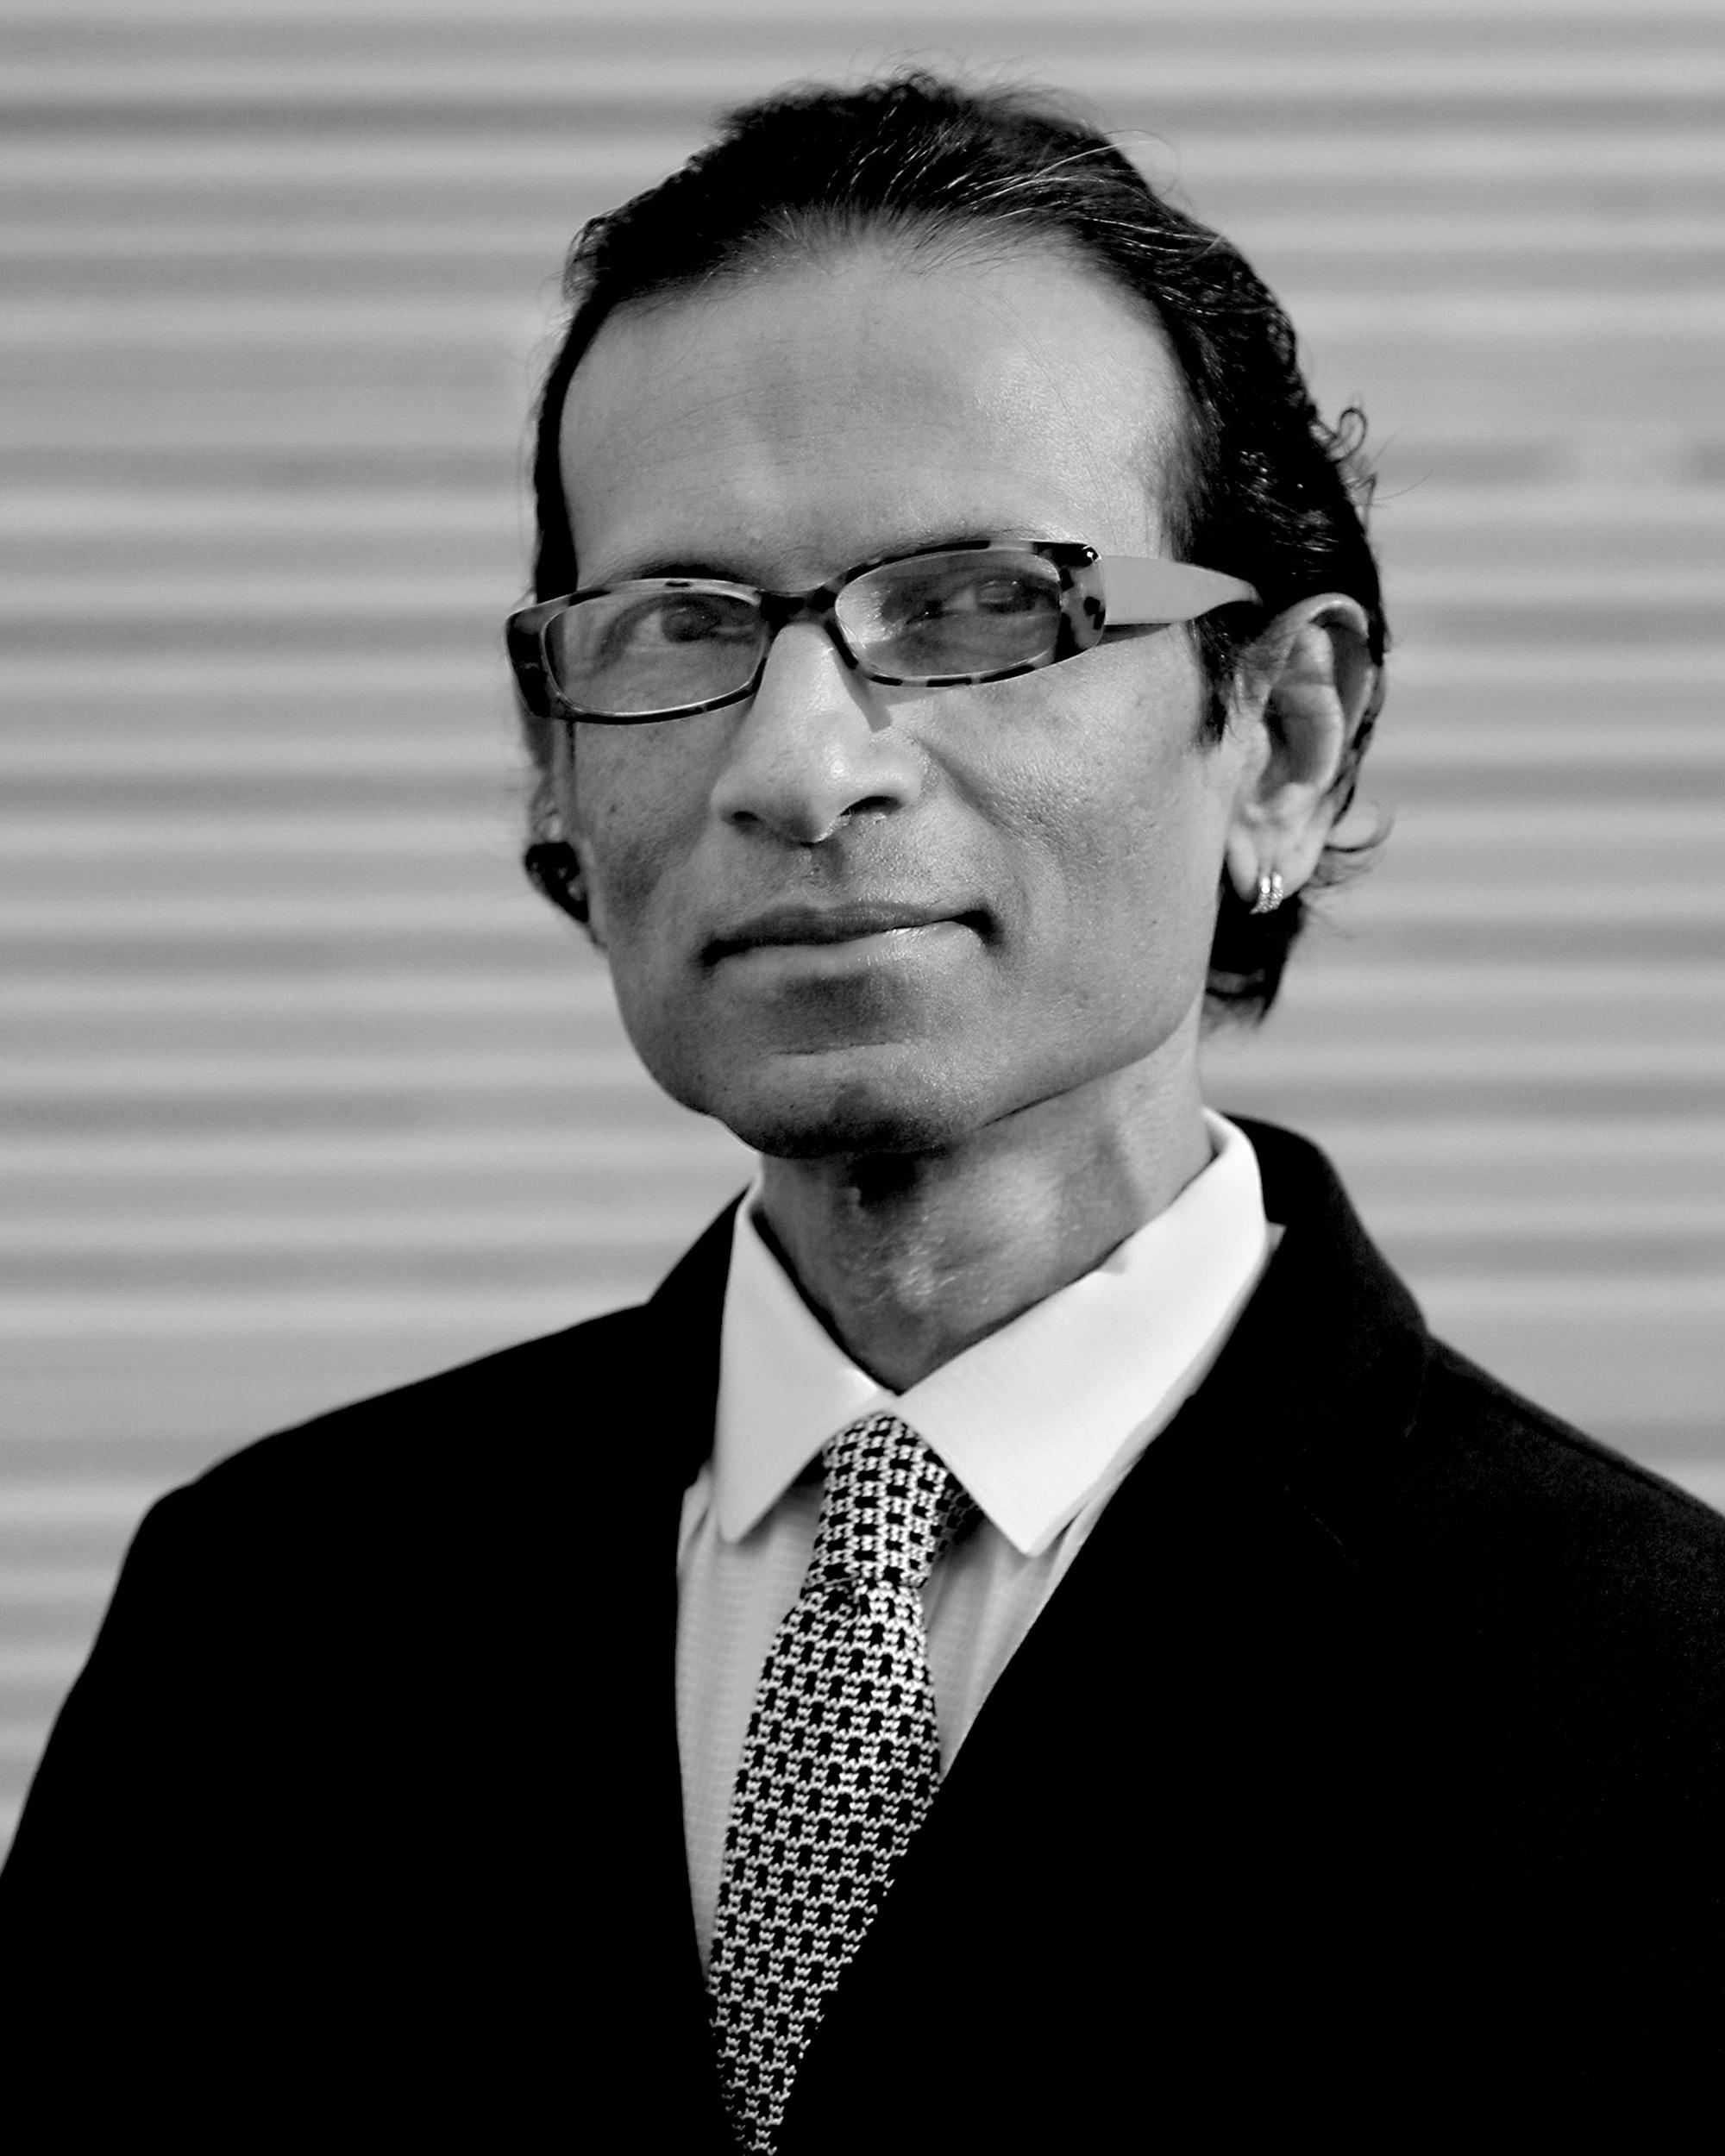 Headshot of Abhijeet Mankar